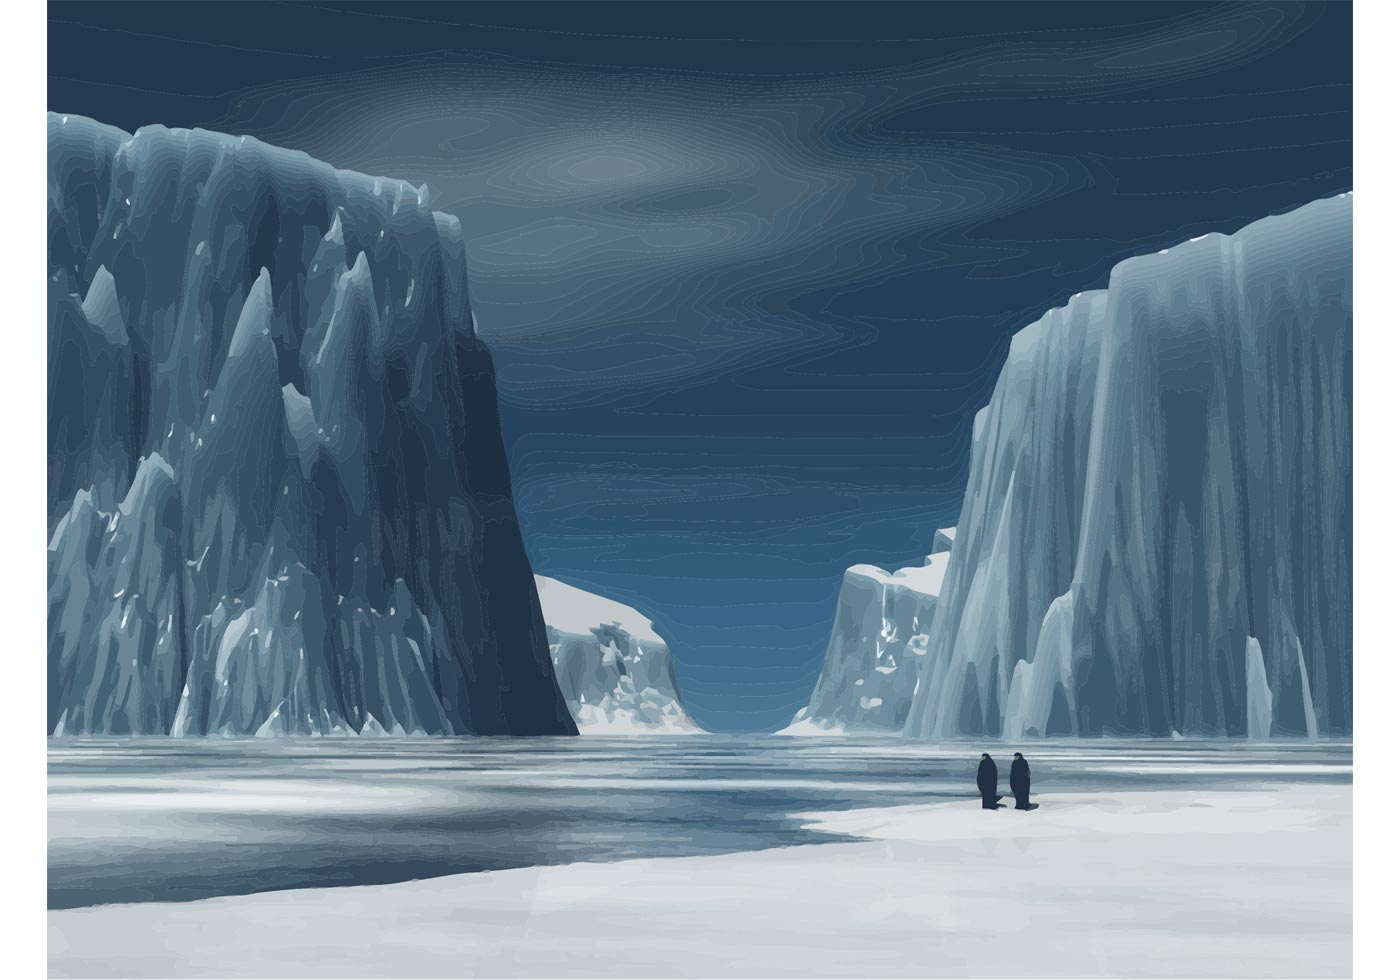 Free Winter Animal Wallpaper Iceberg Download Free Vector Art Stock Graphics Amp Images